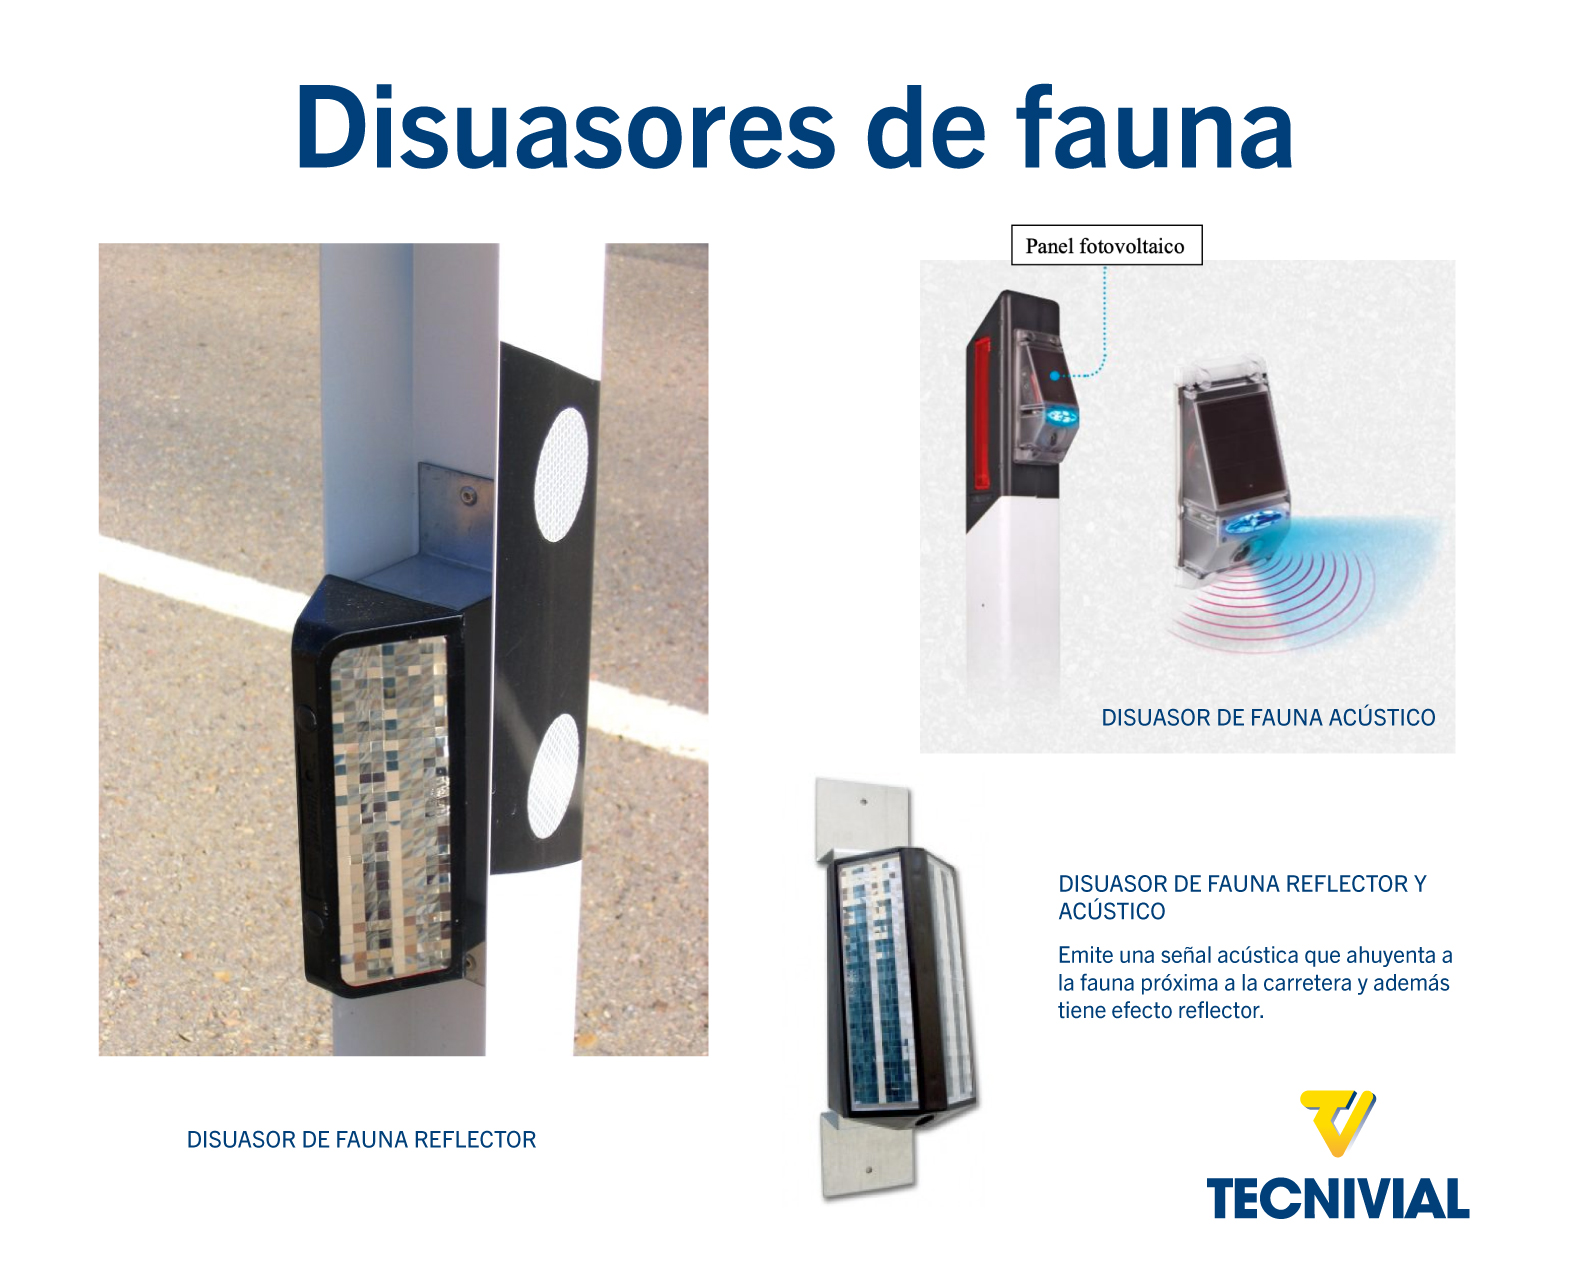 disuadores-de-fauna-carreteras-tecnivial